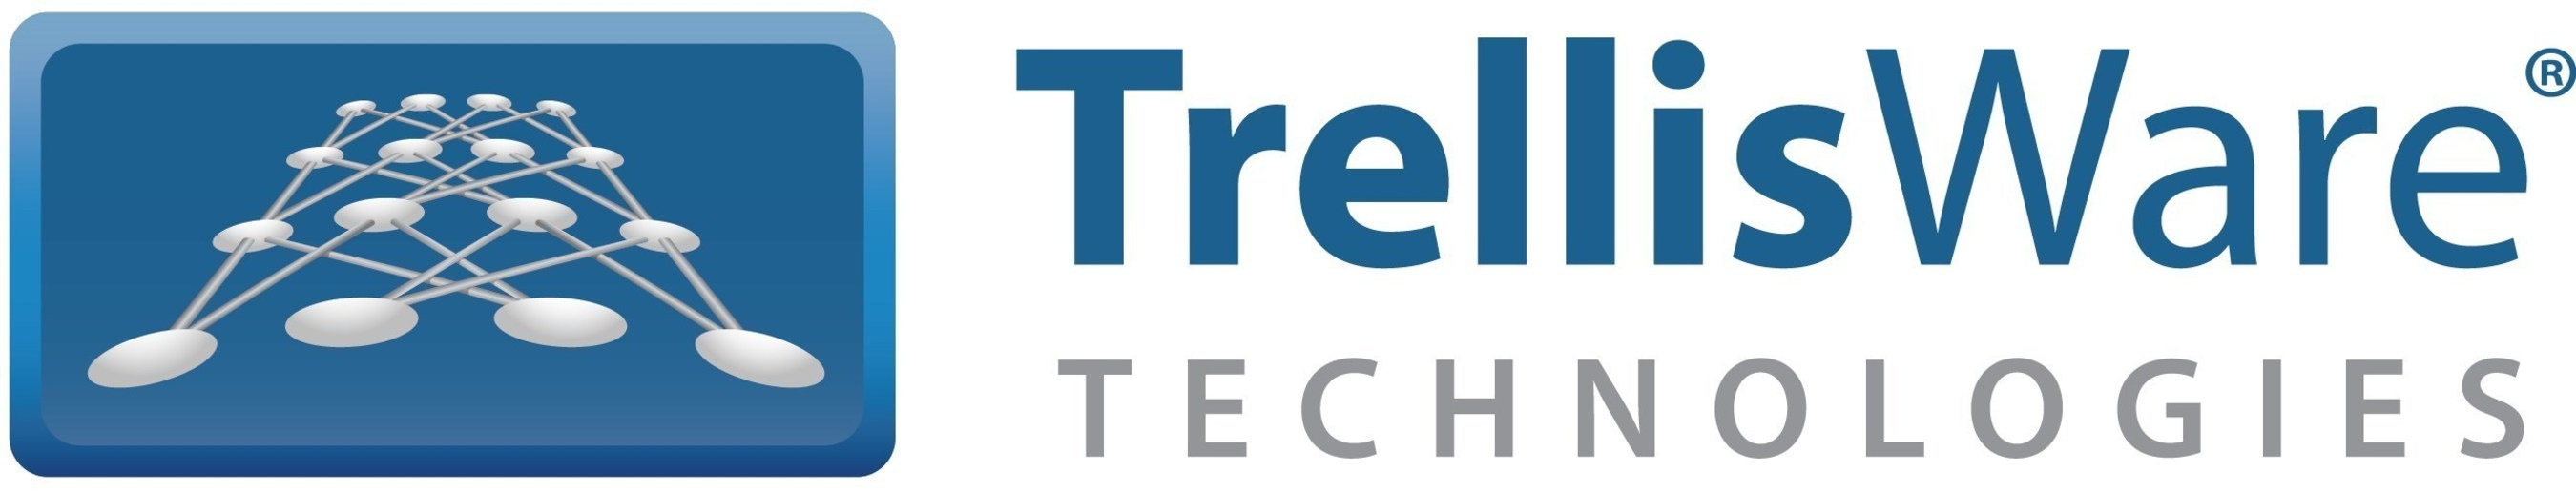 The TrellisWare' TSM-X Waveform Included in Next Generation USSOCOM Handheld Radio Program of Record Award